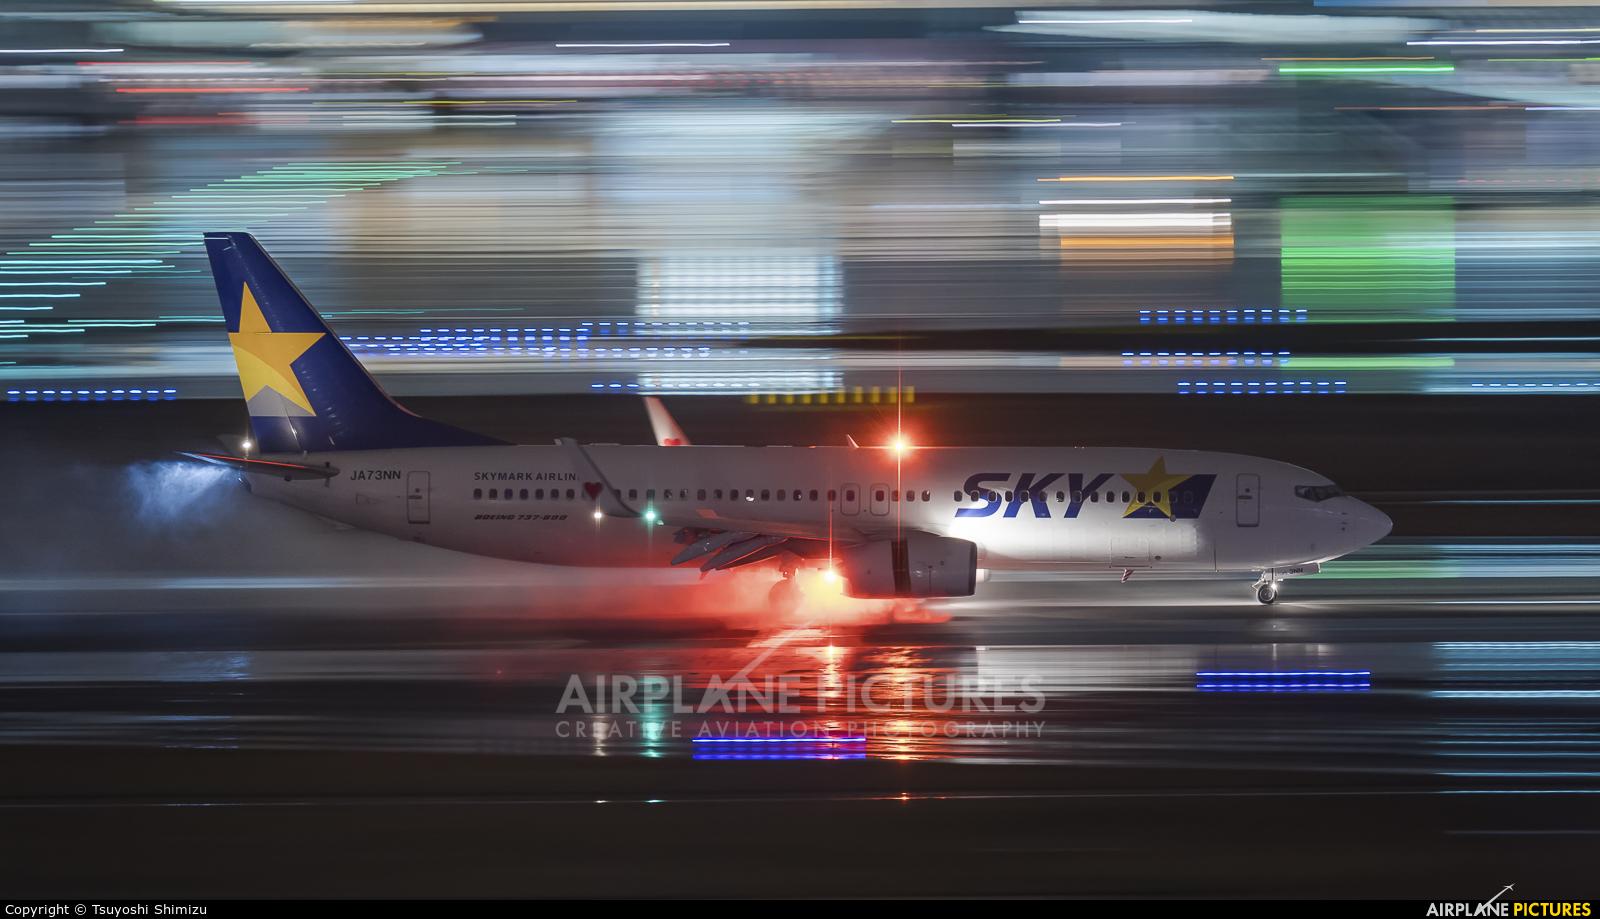 Skymark Airlines JA73NN aircraft at Tokyo - Haneda Intl